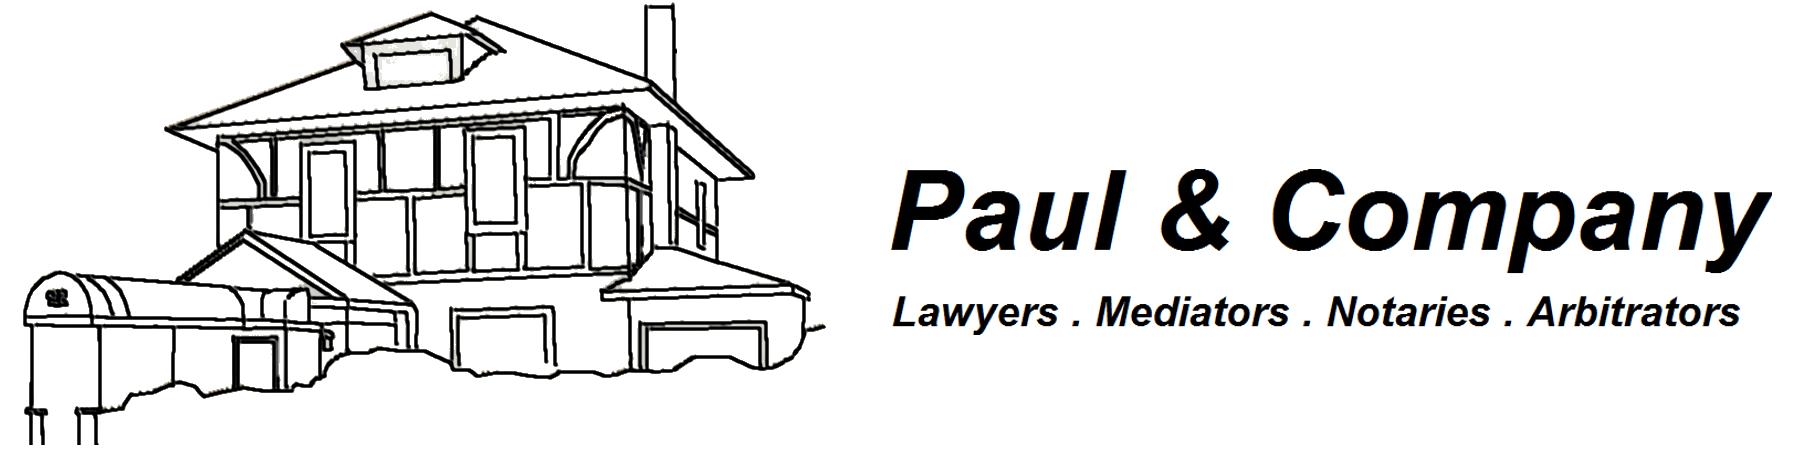 Paul & Company